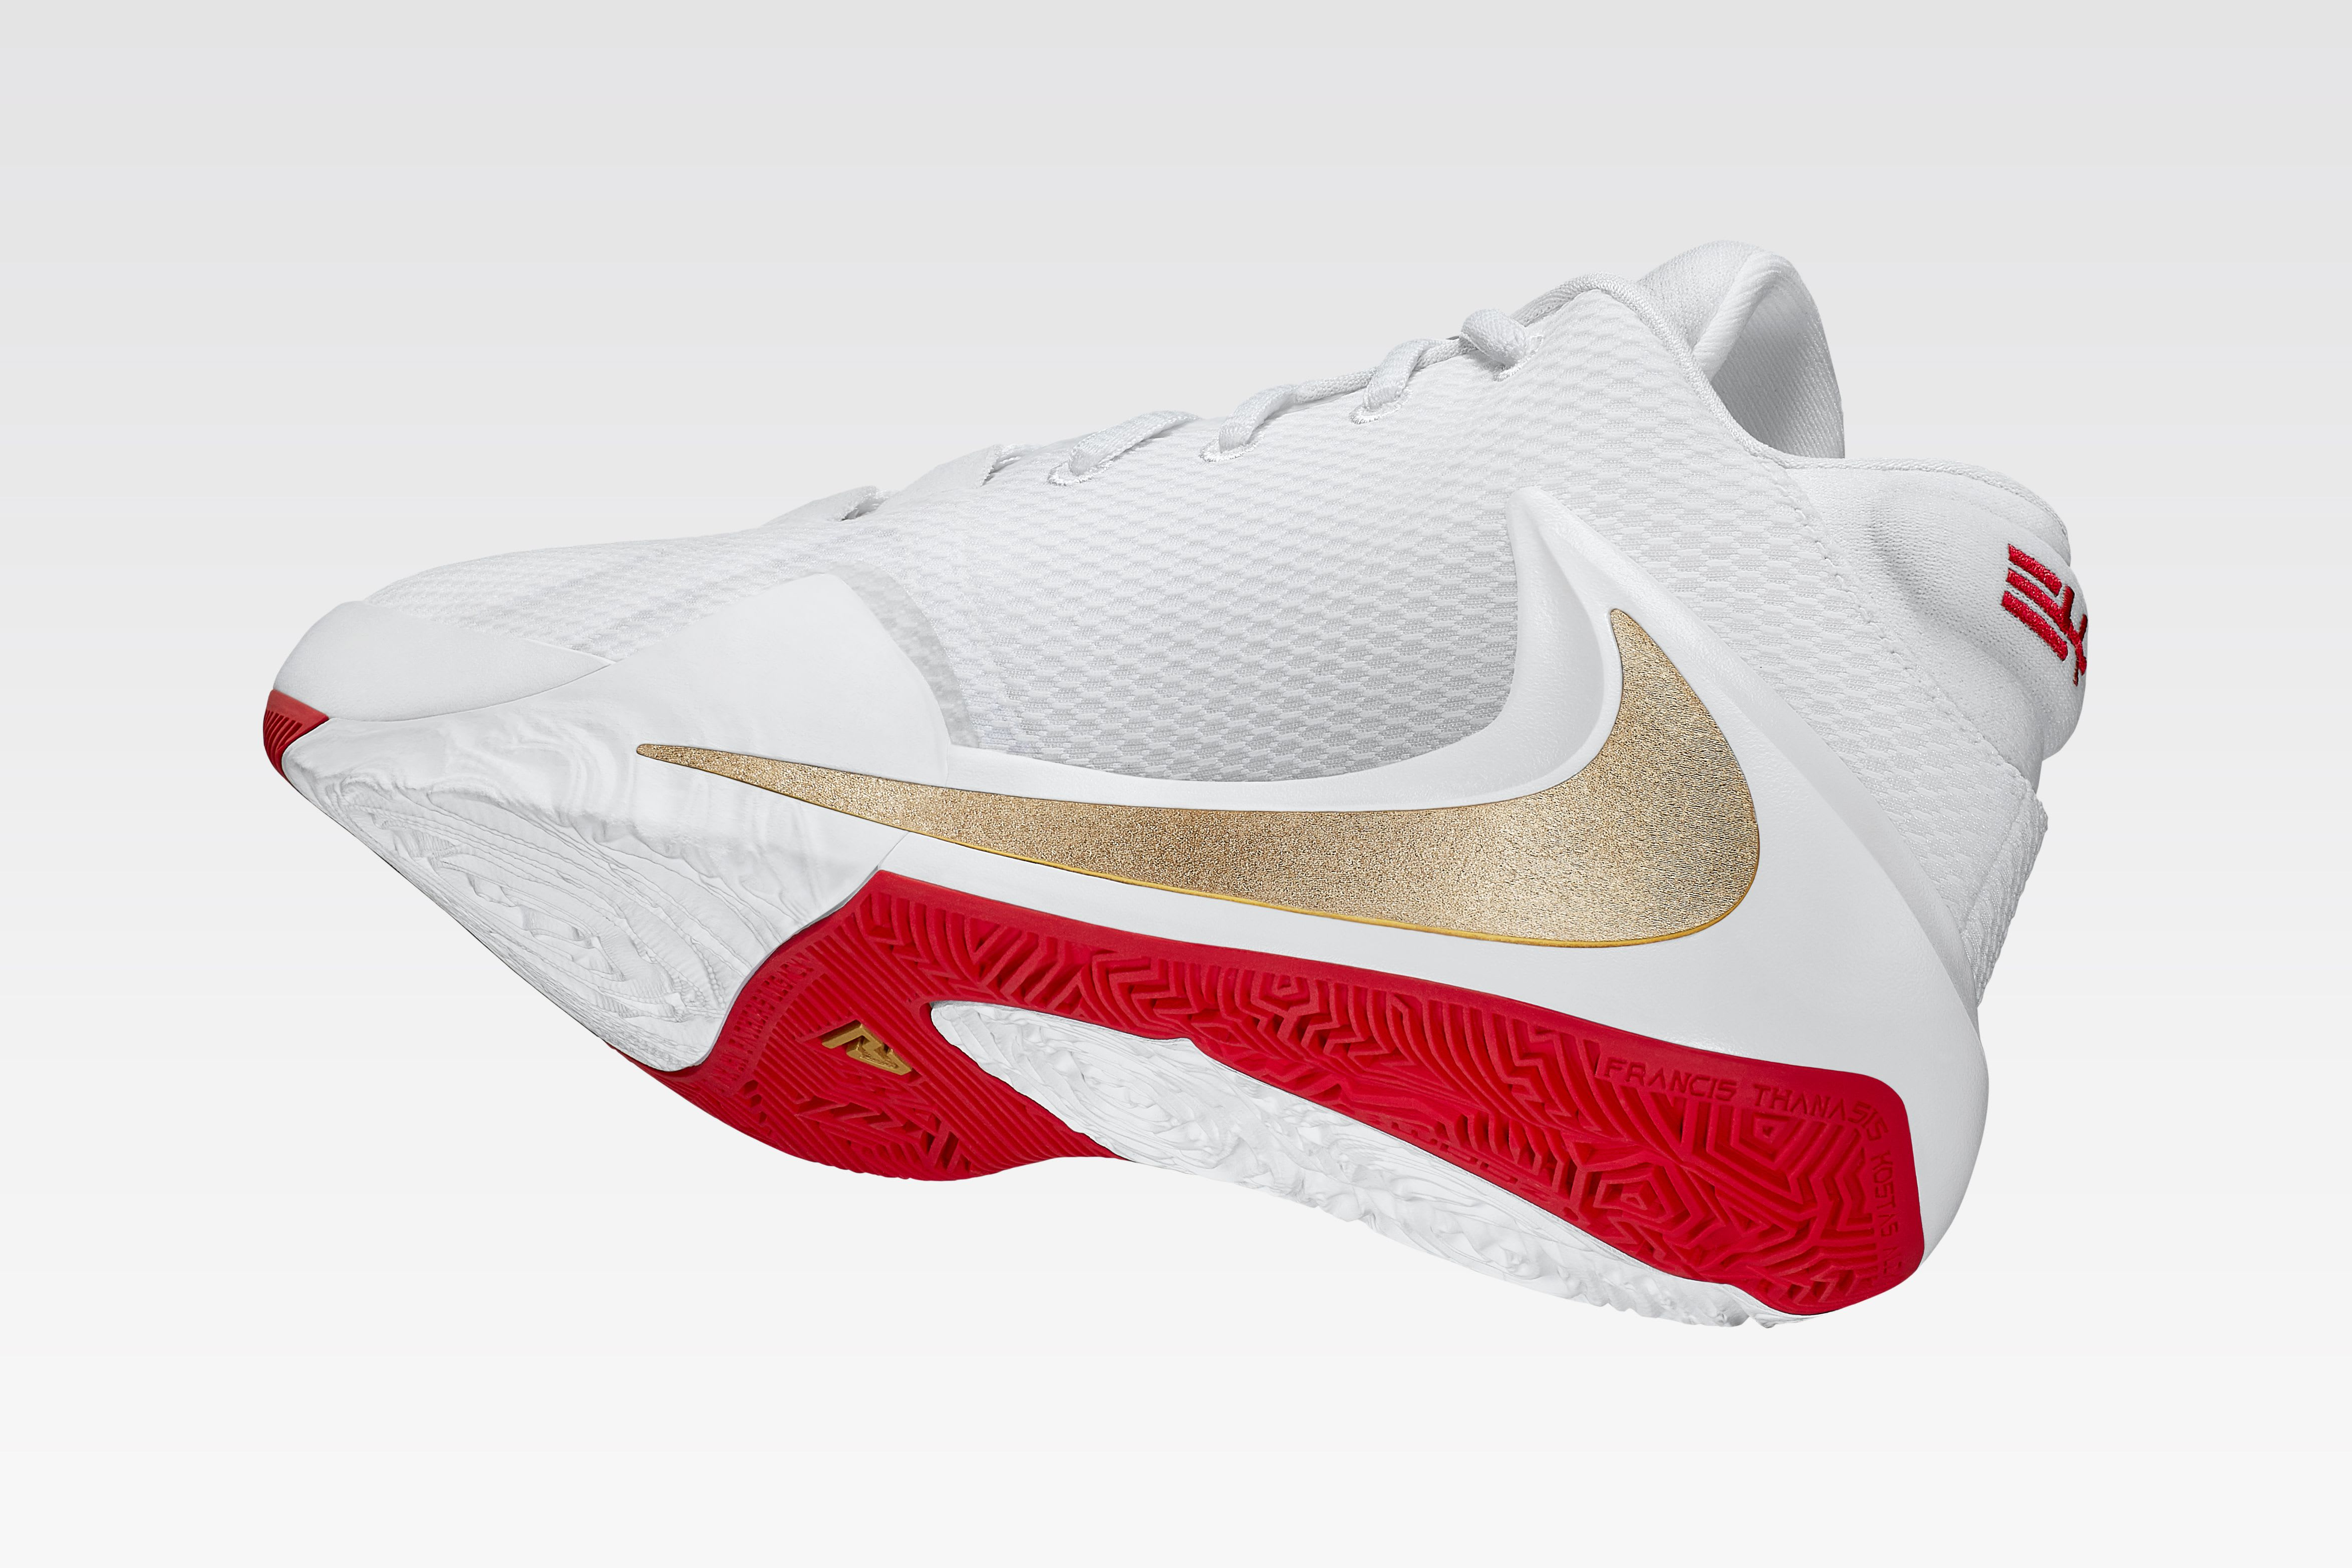 Nike Air Zoom Freak 1 (White/Gold/Red)